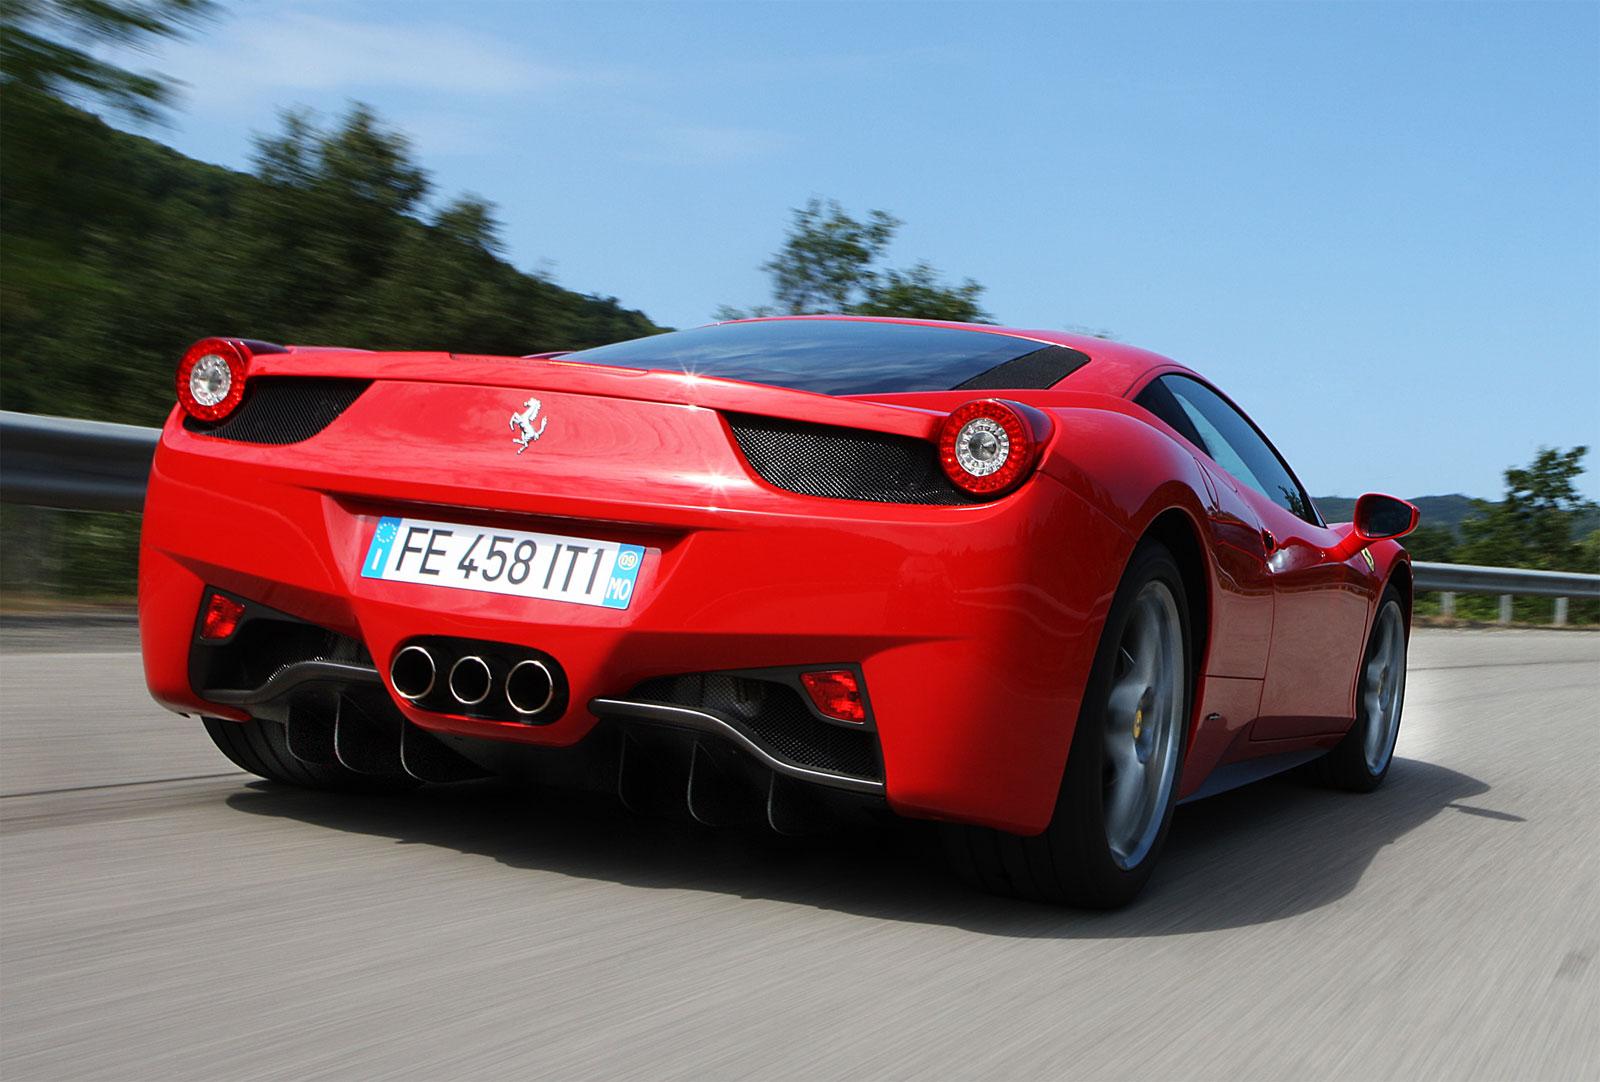 Ferrari458ItaliahdWallpapers2011 6jpg 1600x1082